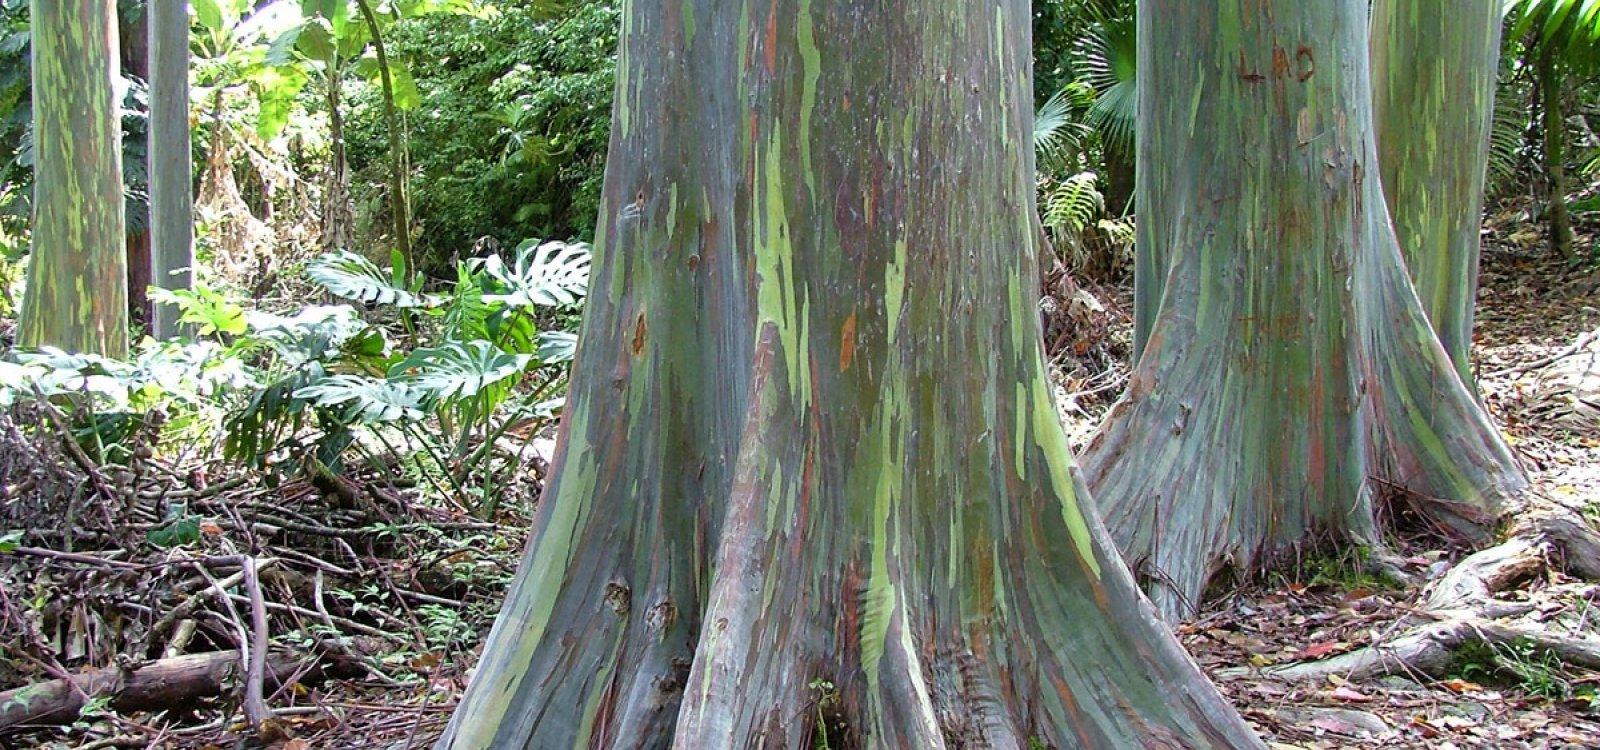 Painted Bark Eucalyptus Trees Photo Gallery